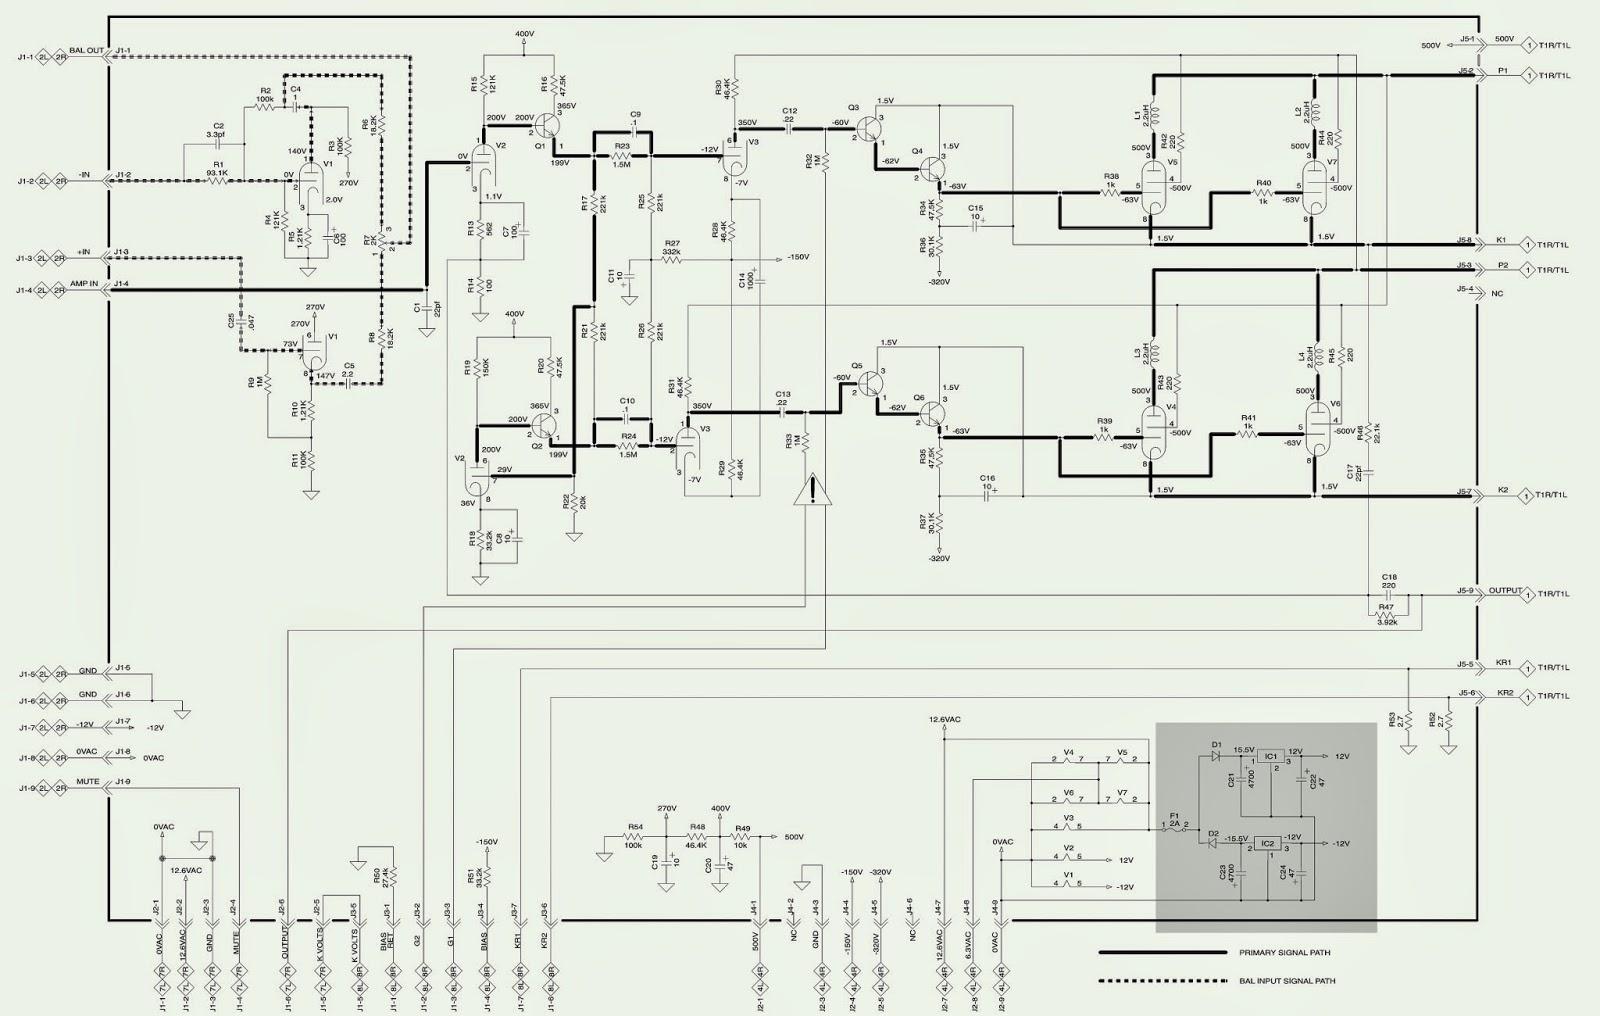 Electronic Equipment Repair Centre February 2015 Led Vu Meter Transistors Schematic In Addition Buzzer Symbol Circuit